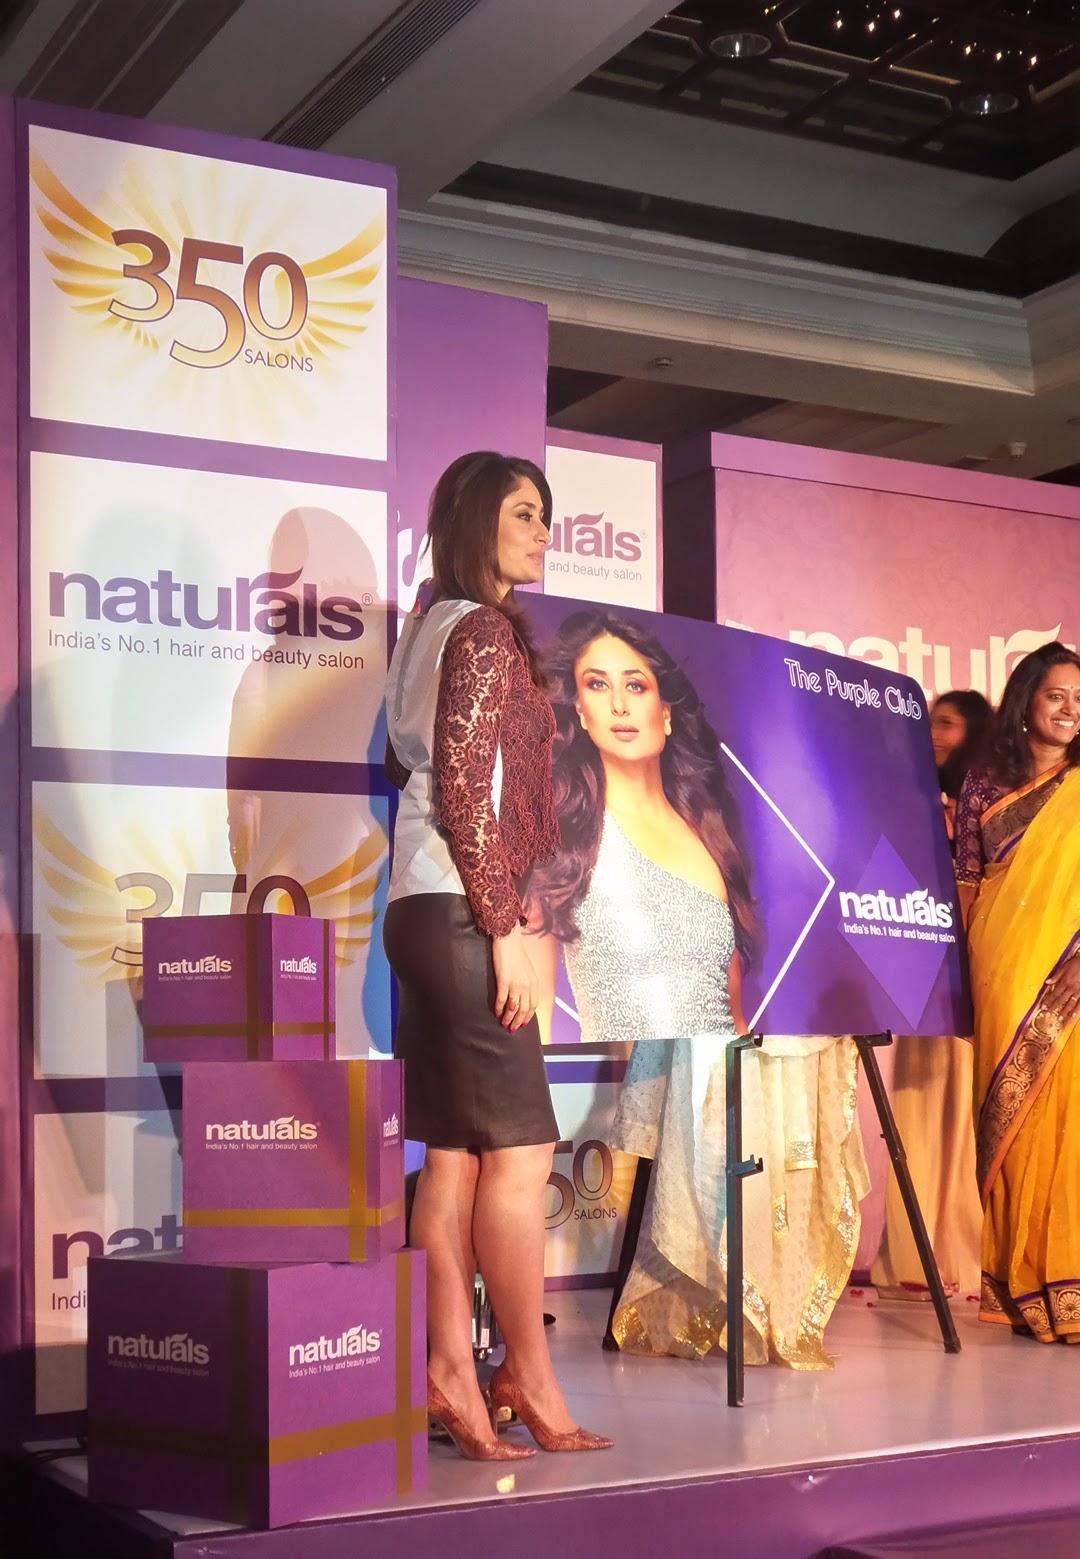 Kareena Kapoor Sexy Legs Hd Images - Hot  Sexy Bikini -9071